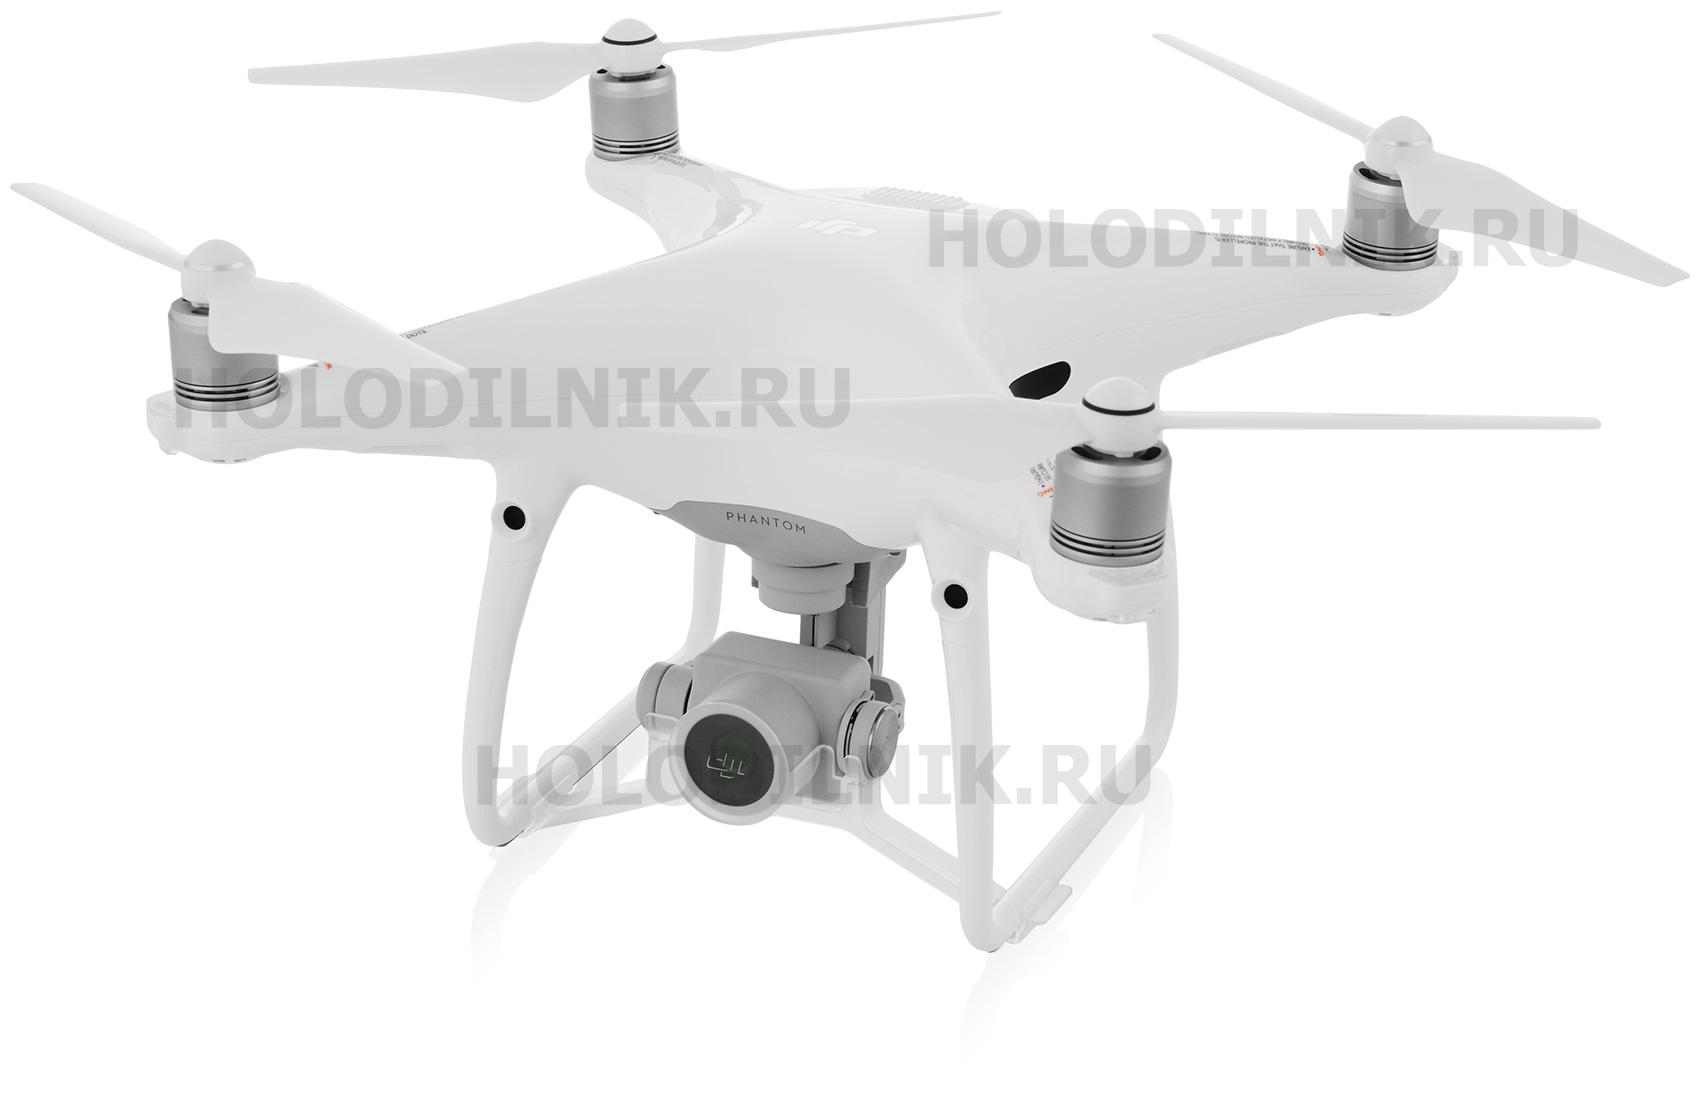 Квадрокоптер dji phantom 4 купить в спб характеристики mavic цена, инструкция, комплектация